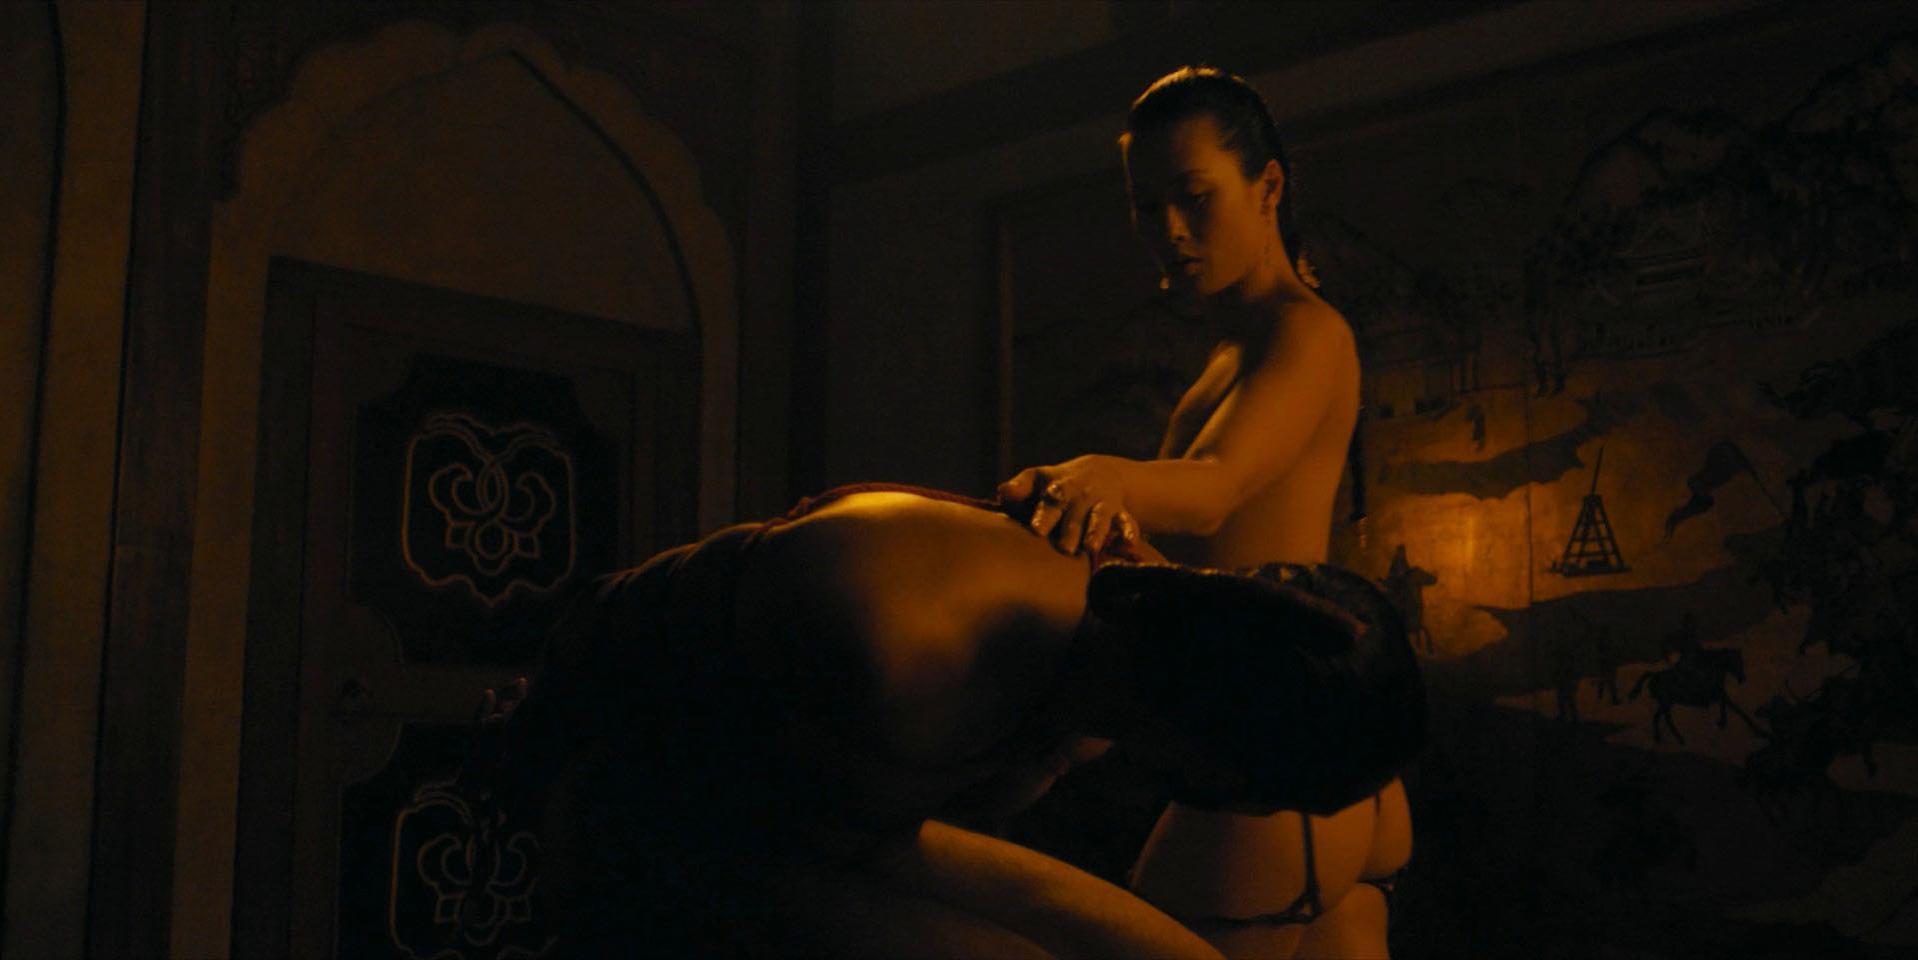 Olivia Cheng nude - Marco Polo s02e05 (2016)